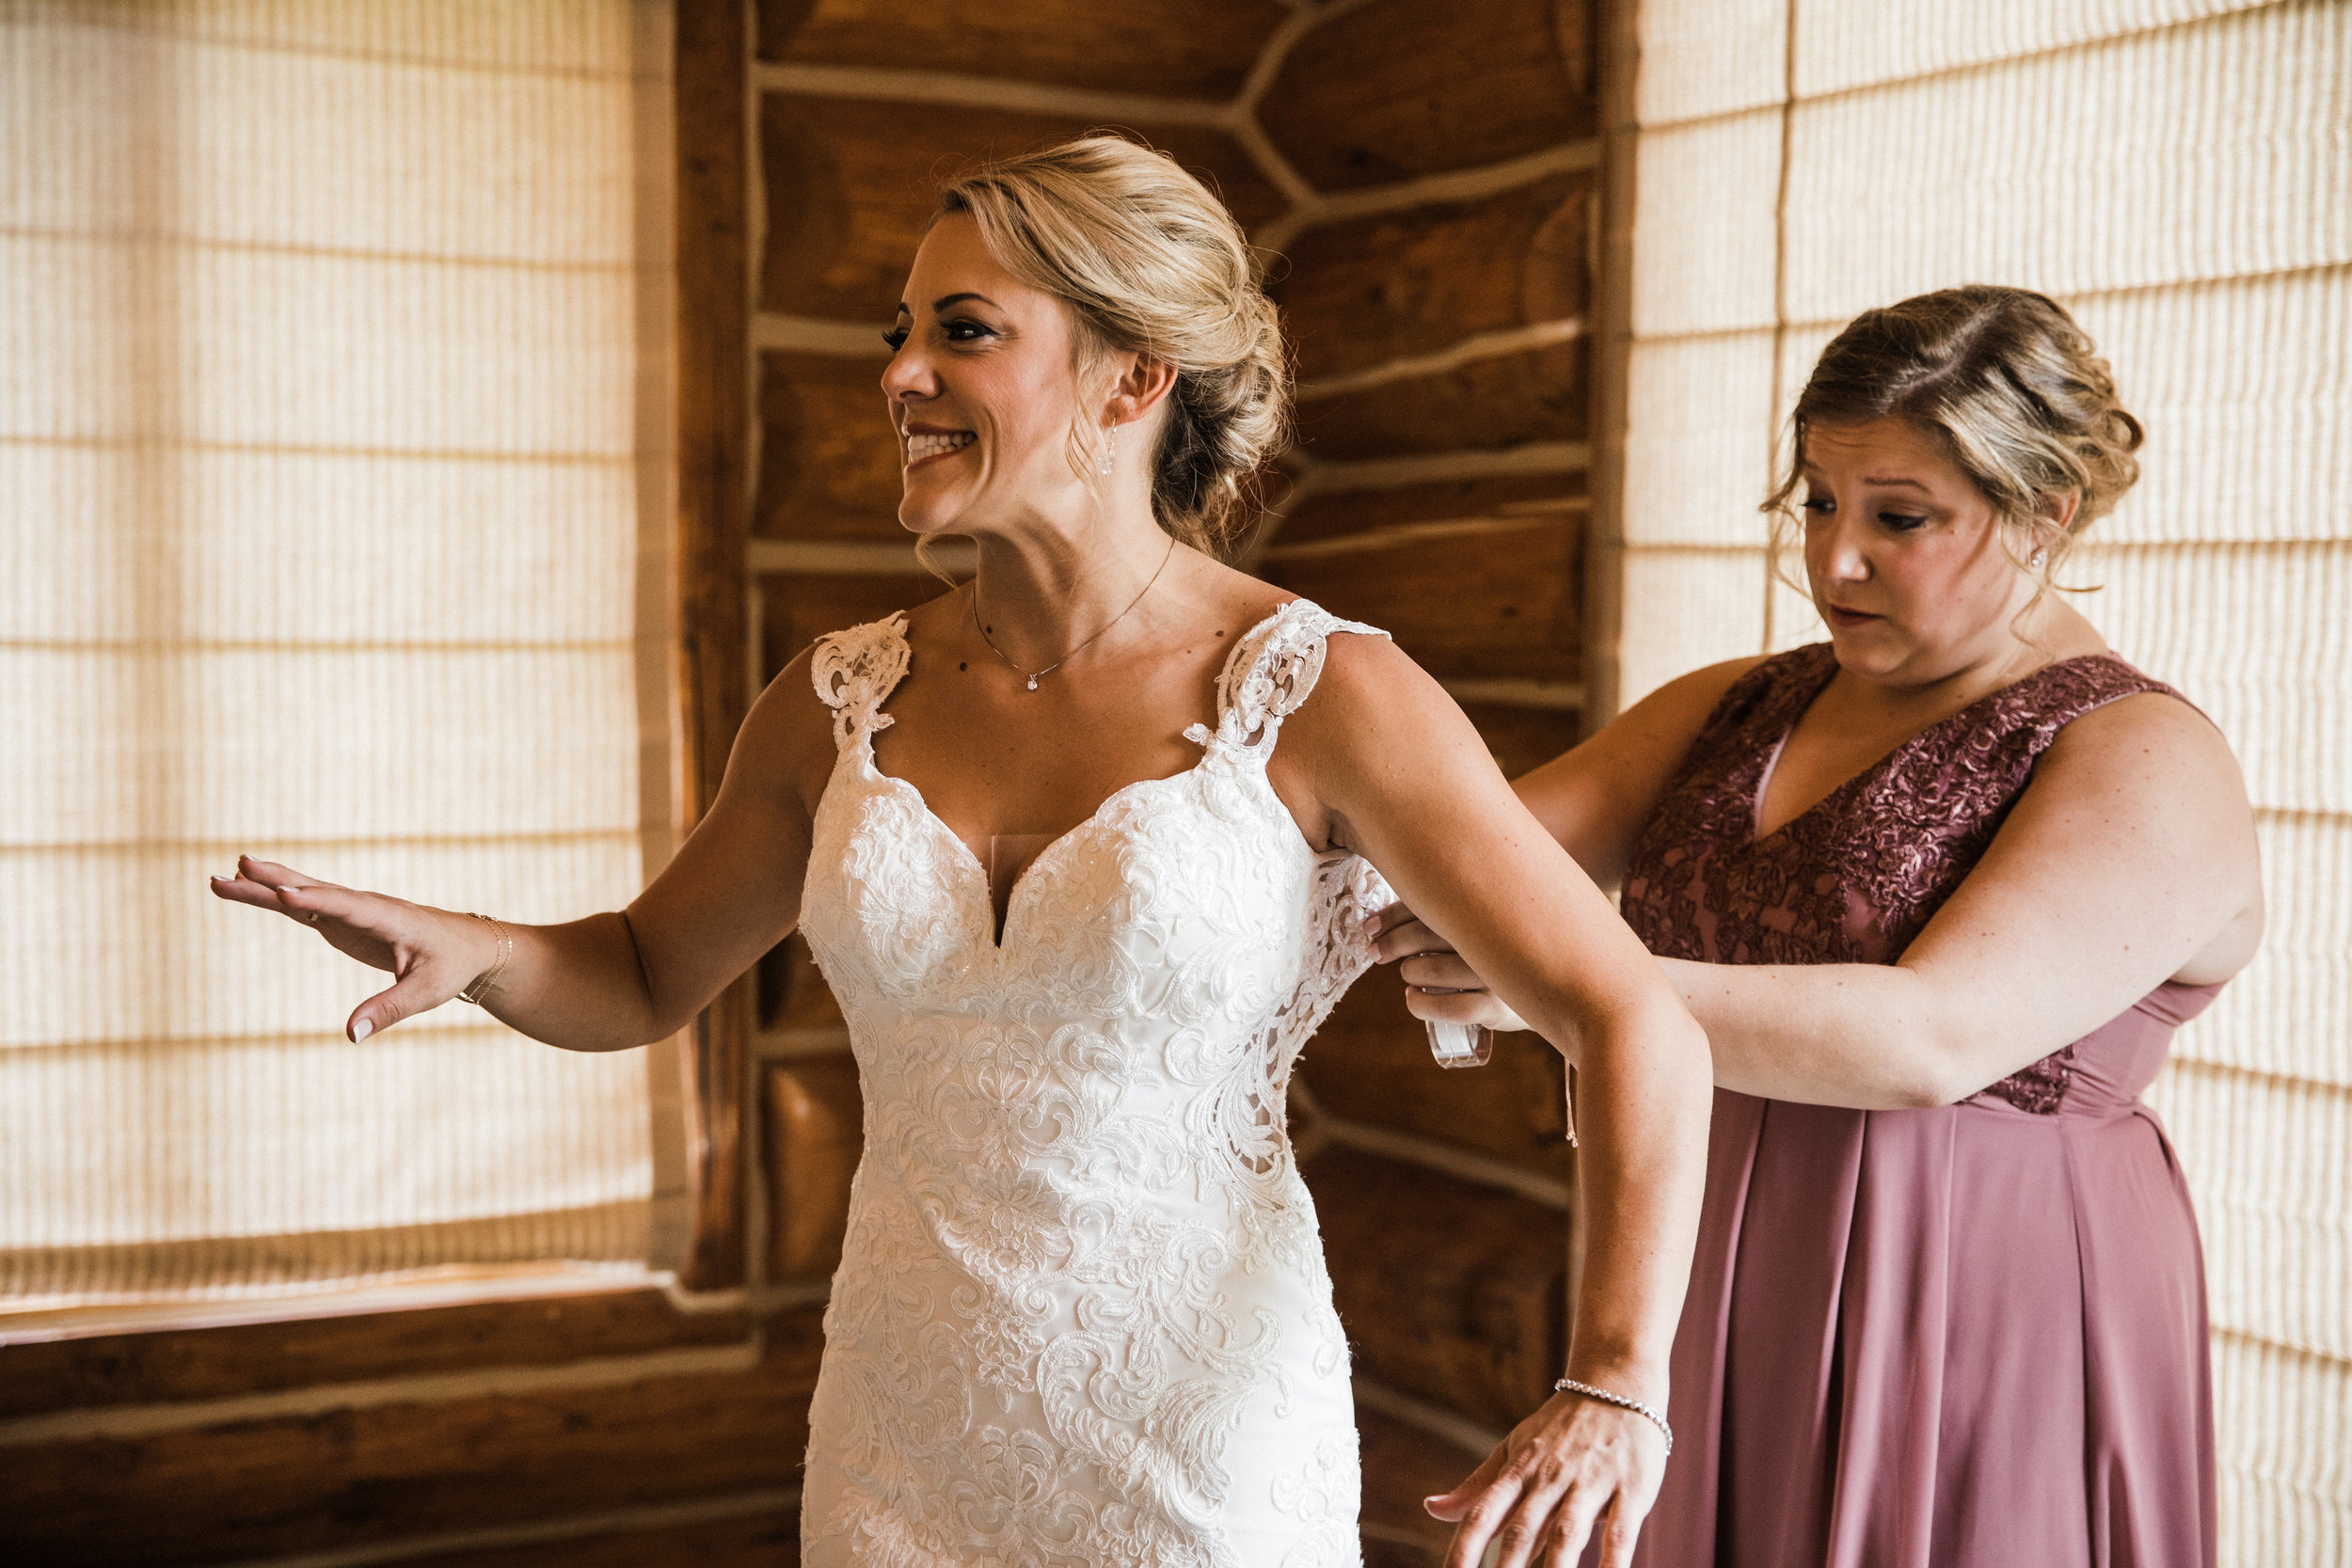 leahandashton-telluride-wedding-photography-0035.jpg